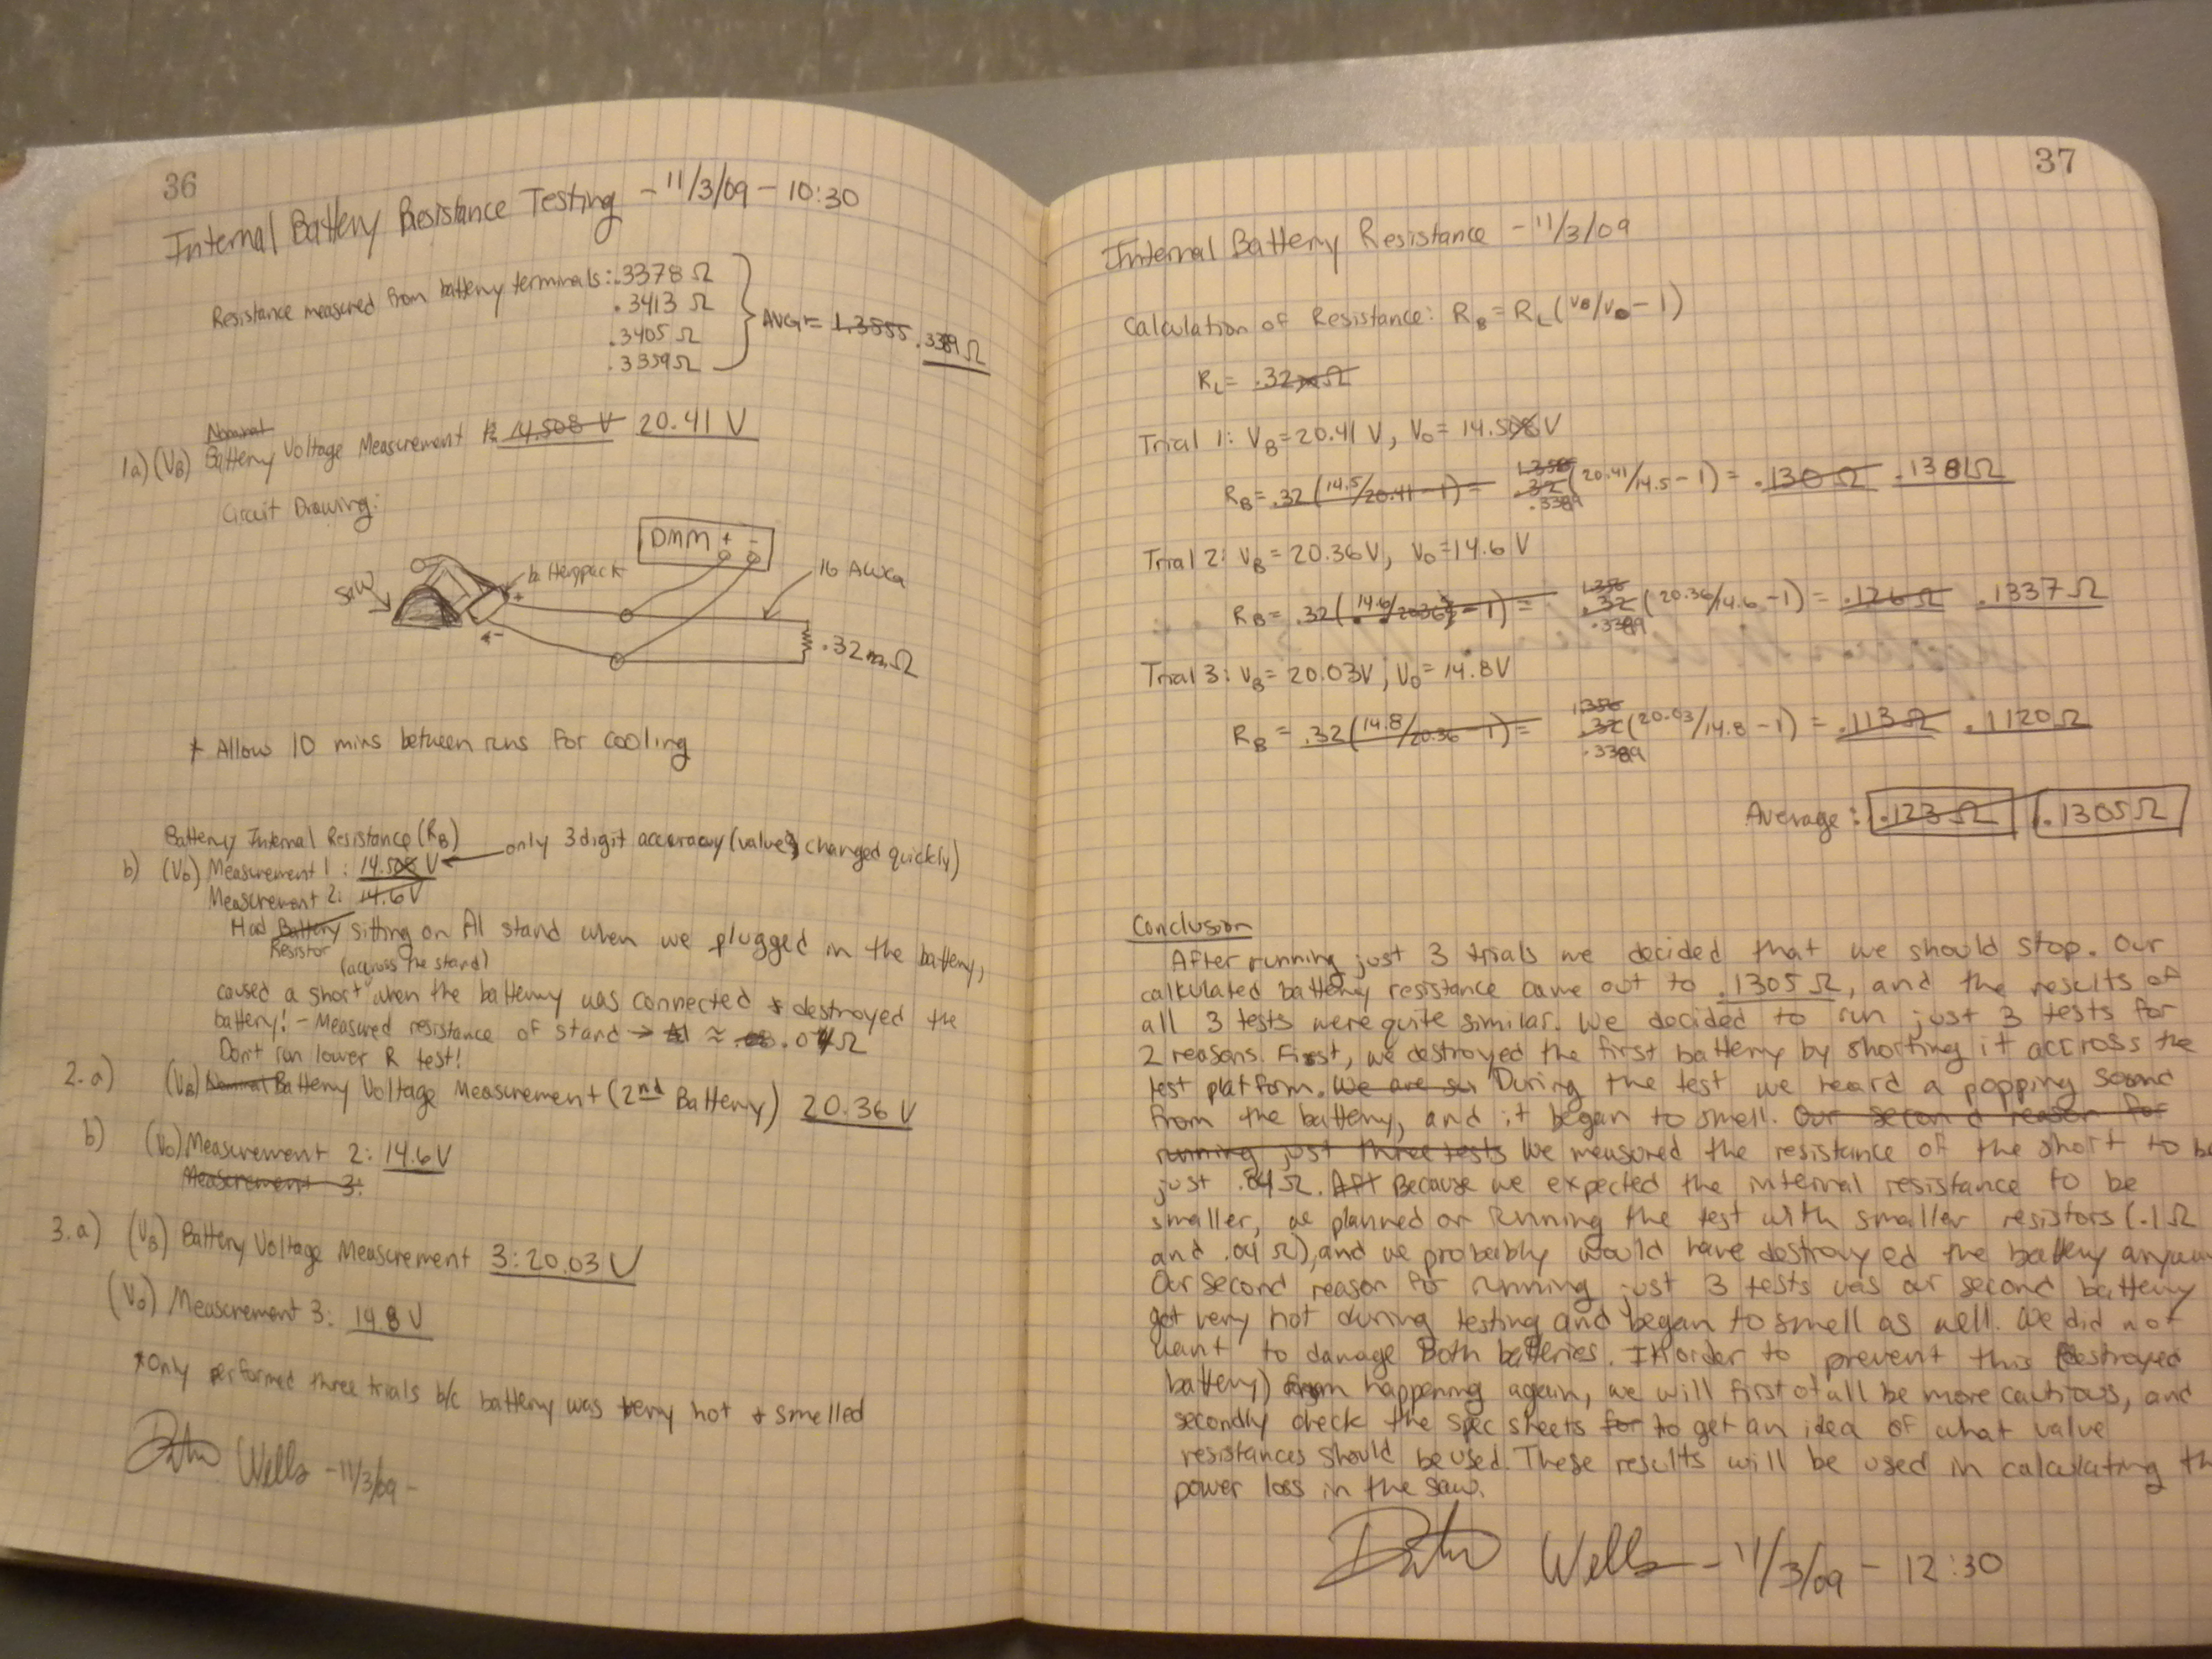 index  prusteeseniordesignengineer notebook